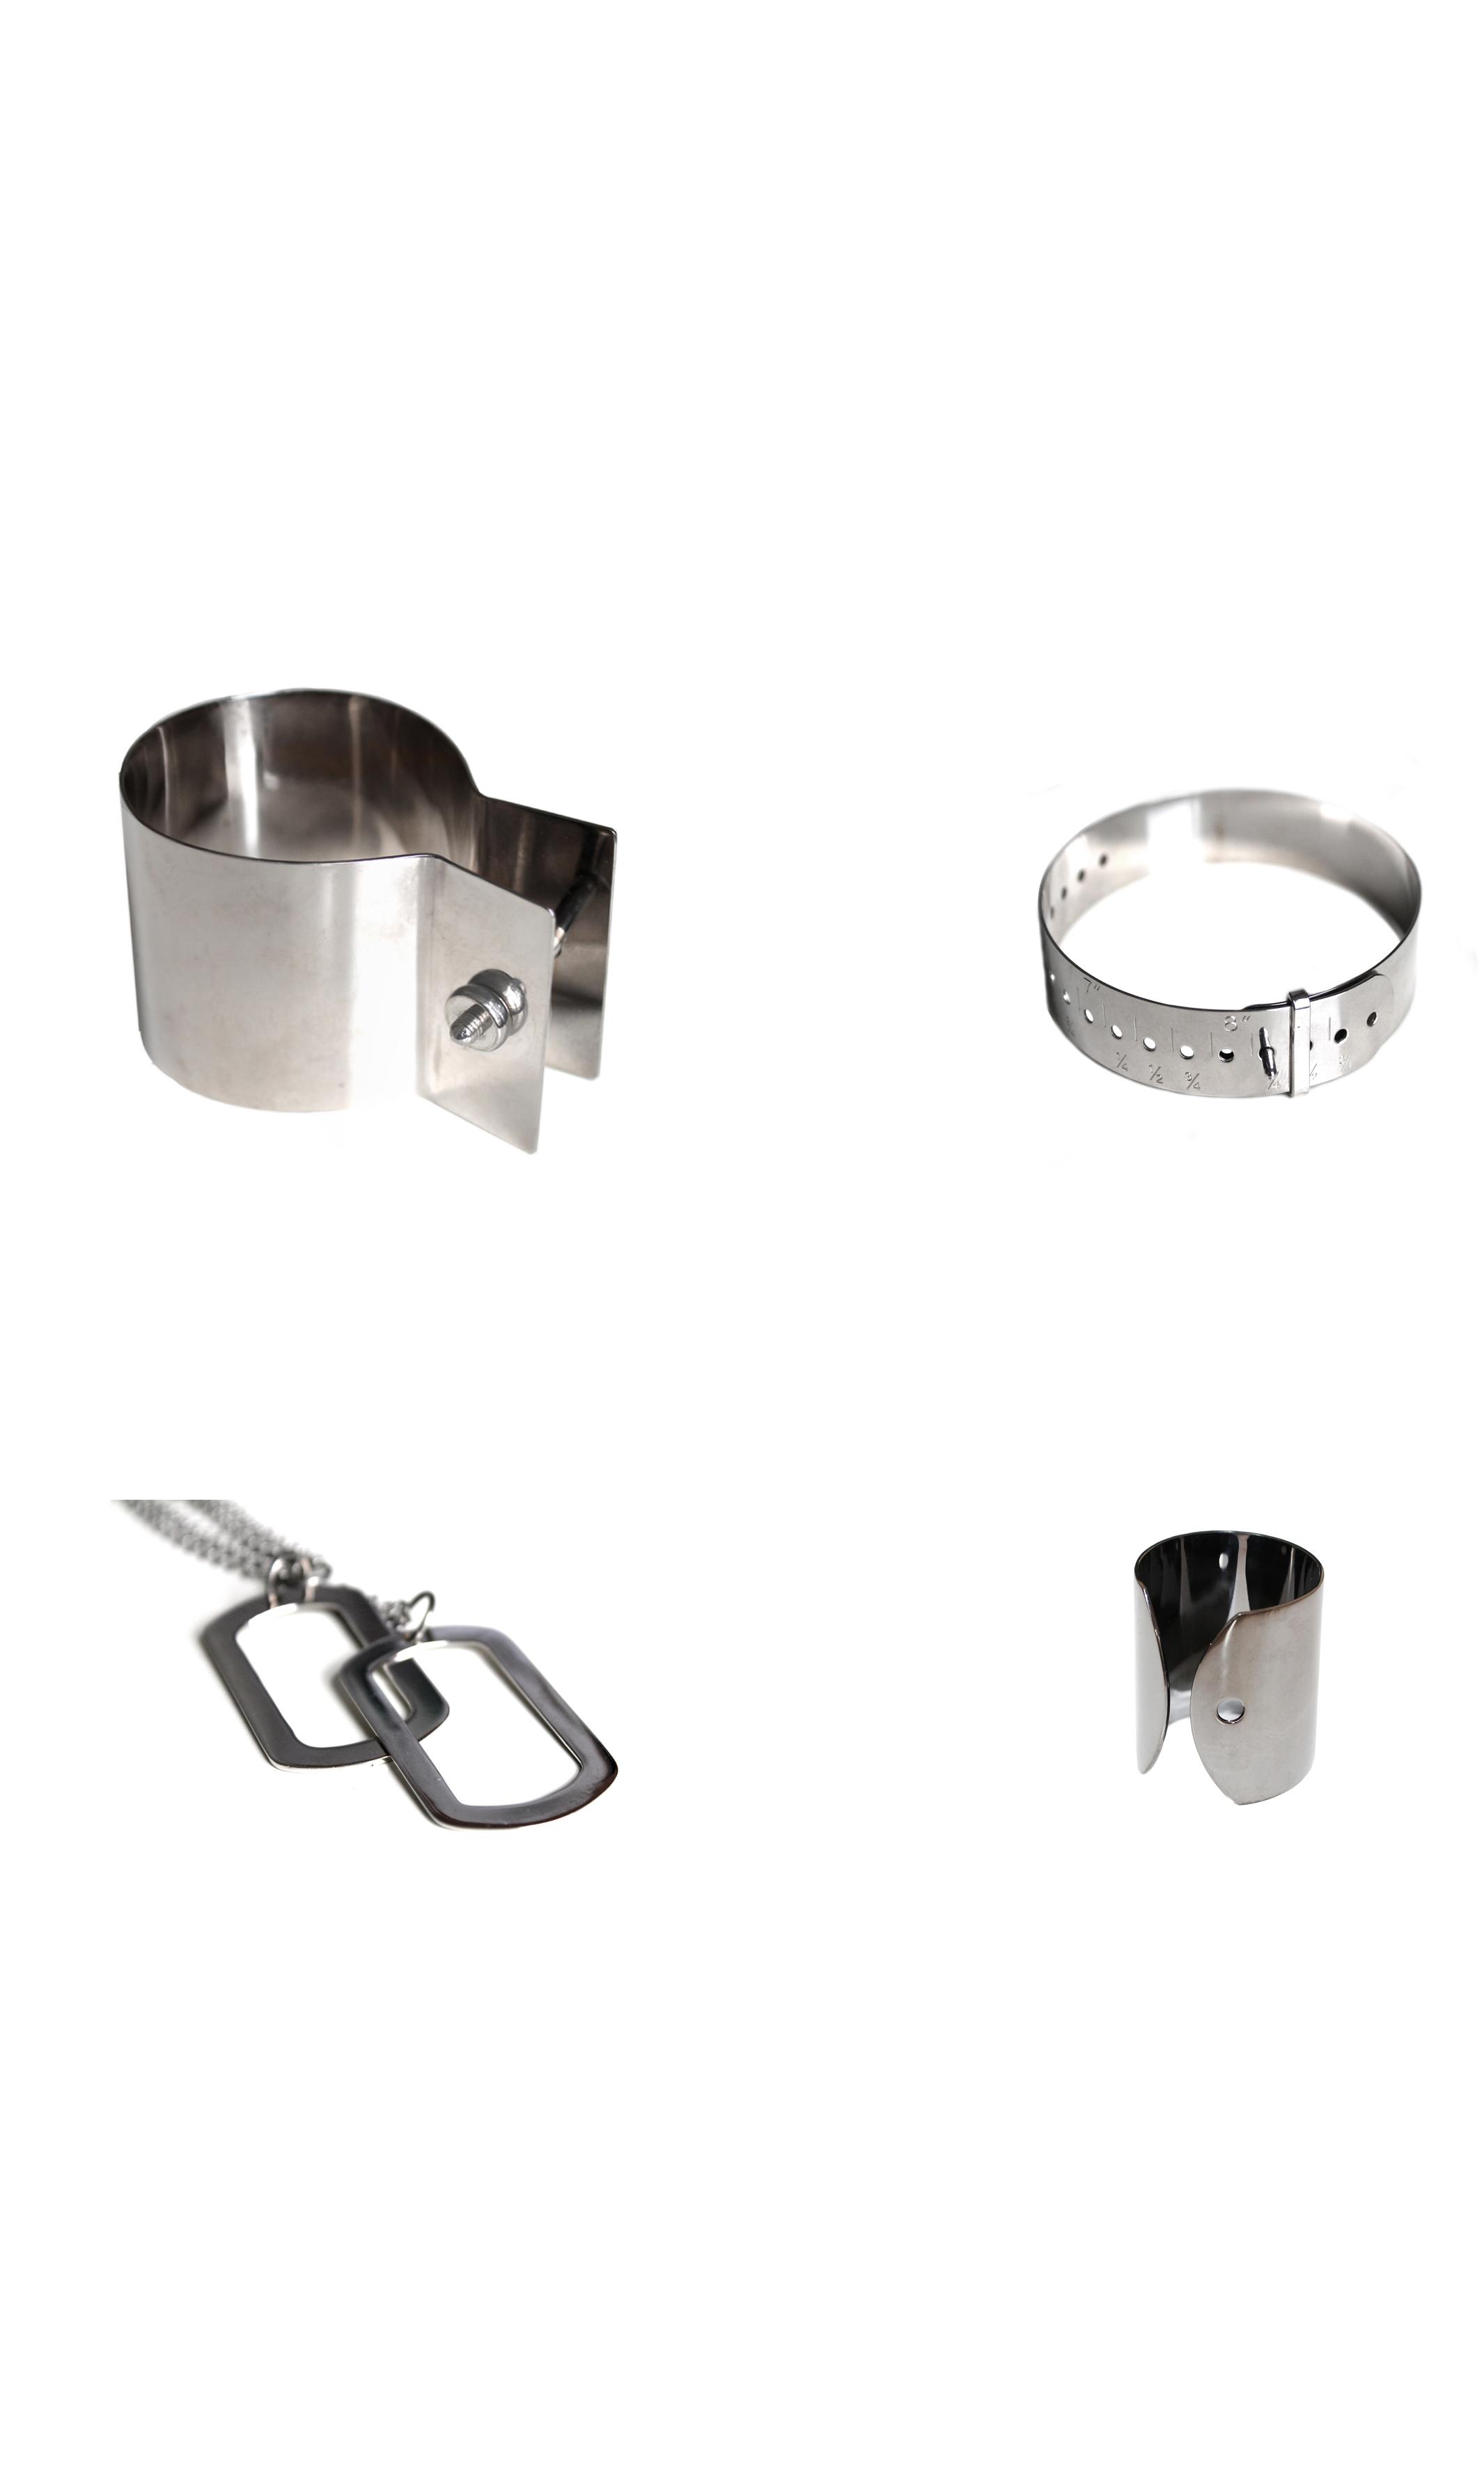 matthew products.jpg